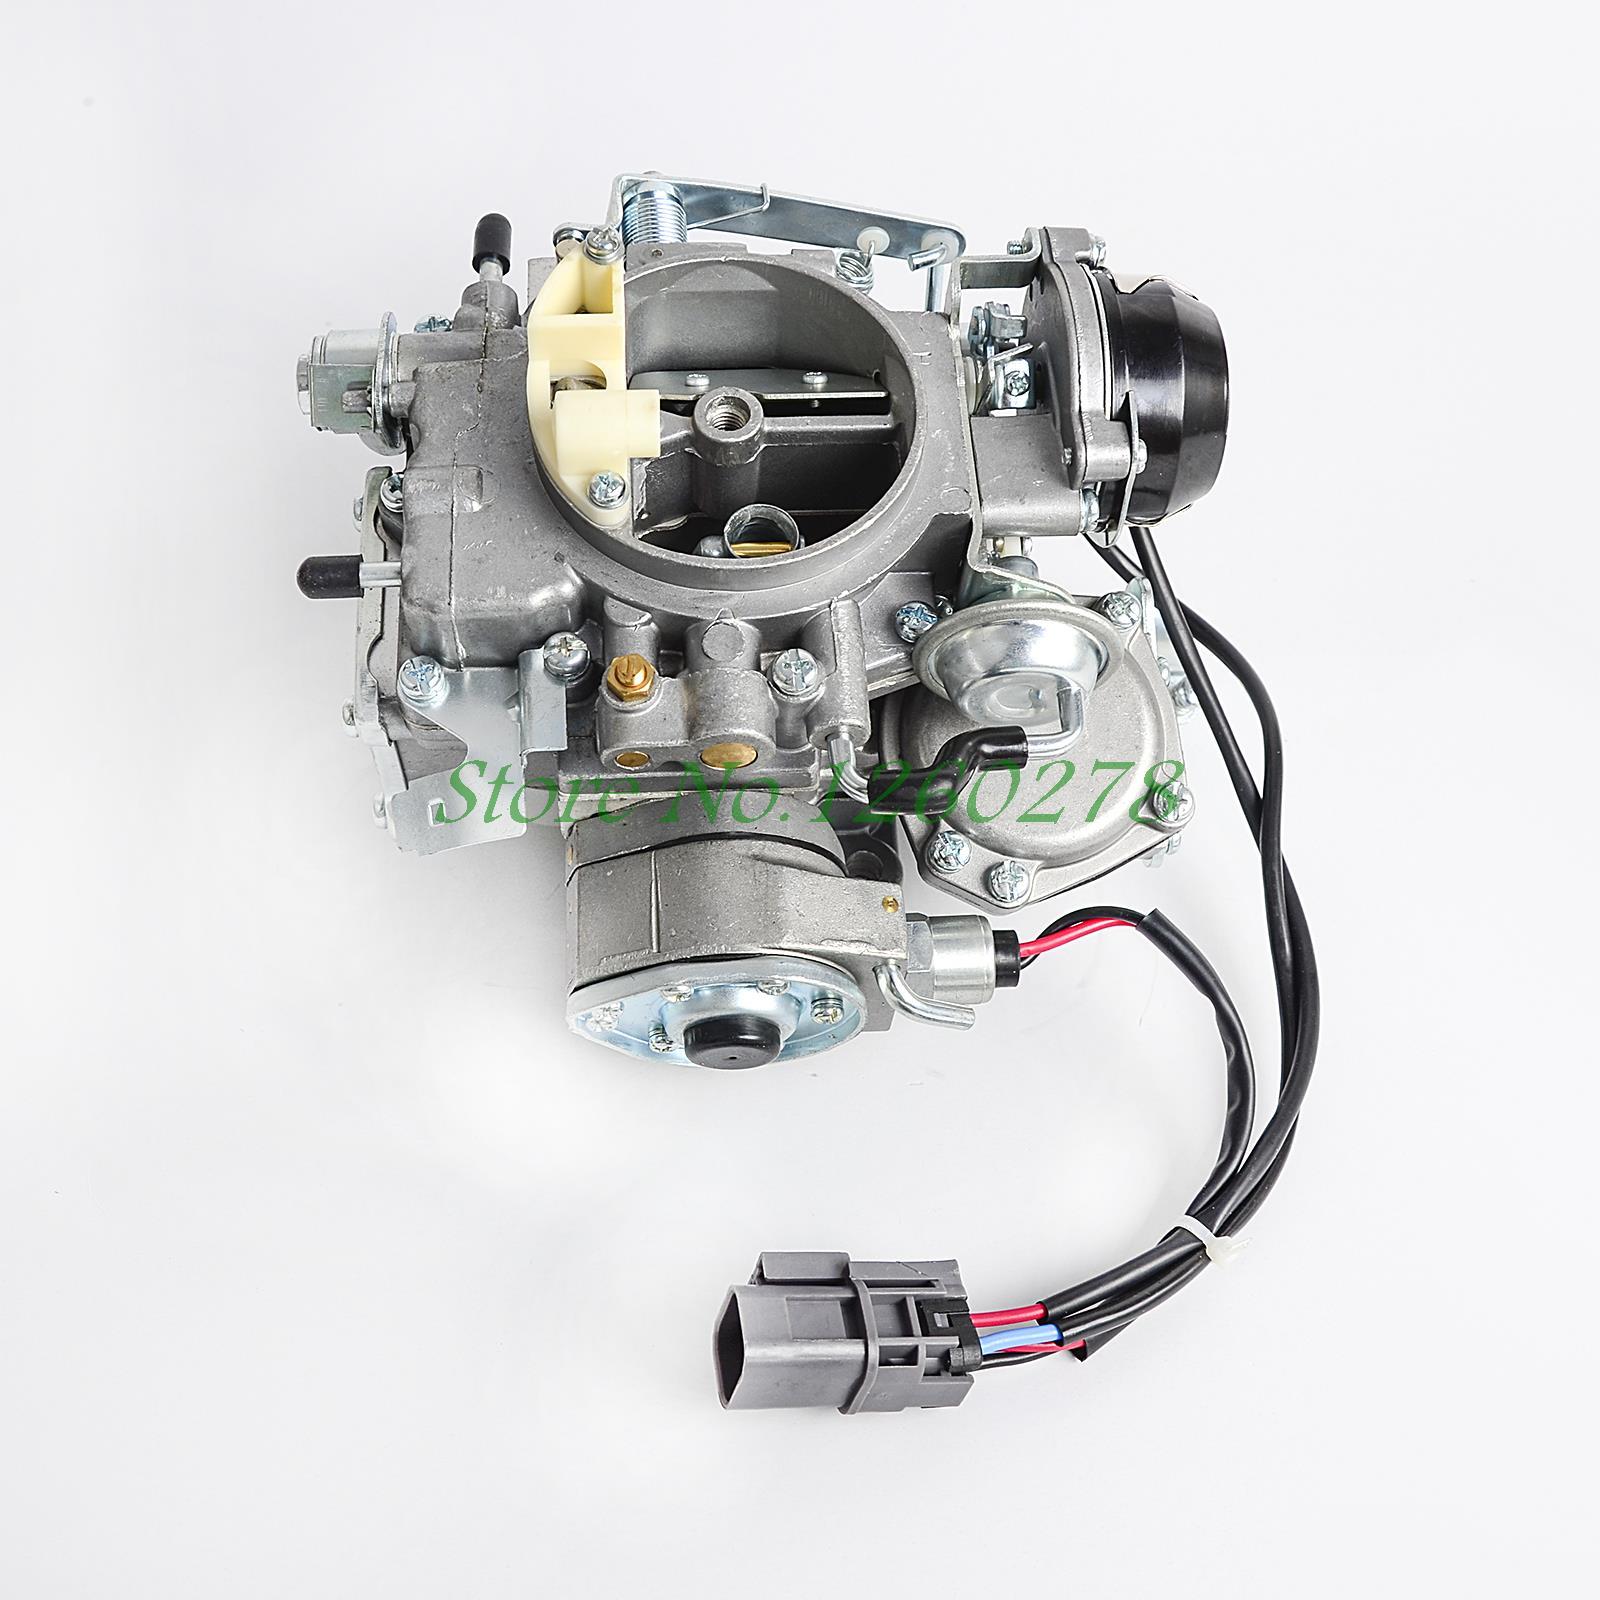 NICECNC CARBURETTOR CARBY CARBIE VERY RARE FOR NISSAN PATROL GQ Y60 6 Cylinders Engine TB42 4.2L 1988 1995 RB30 3.0L 1990 1997